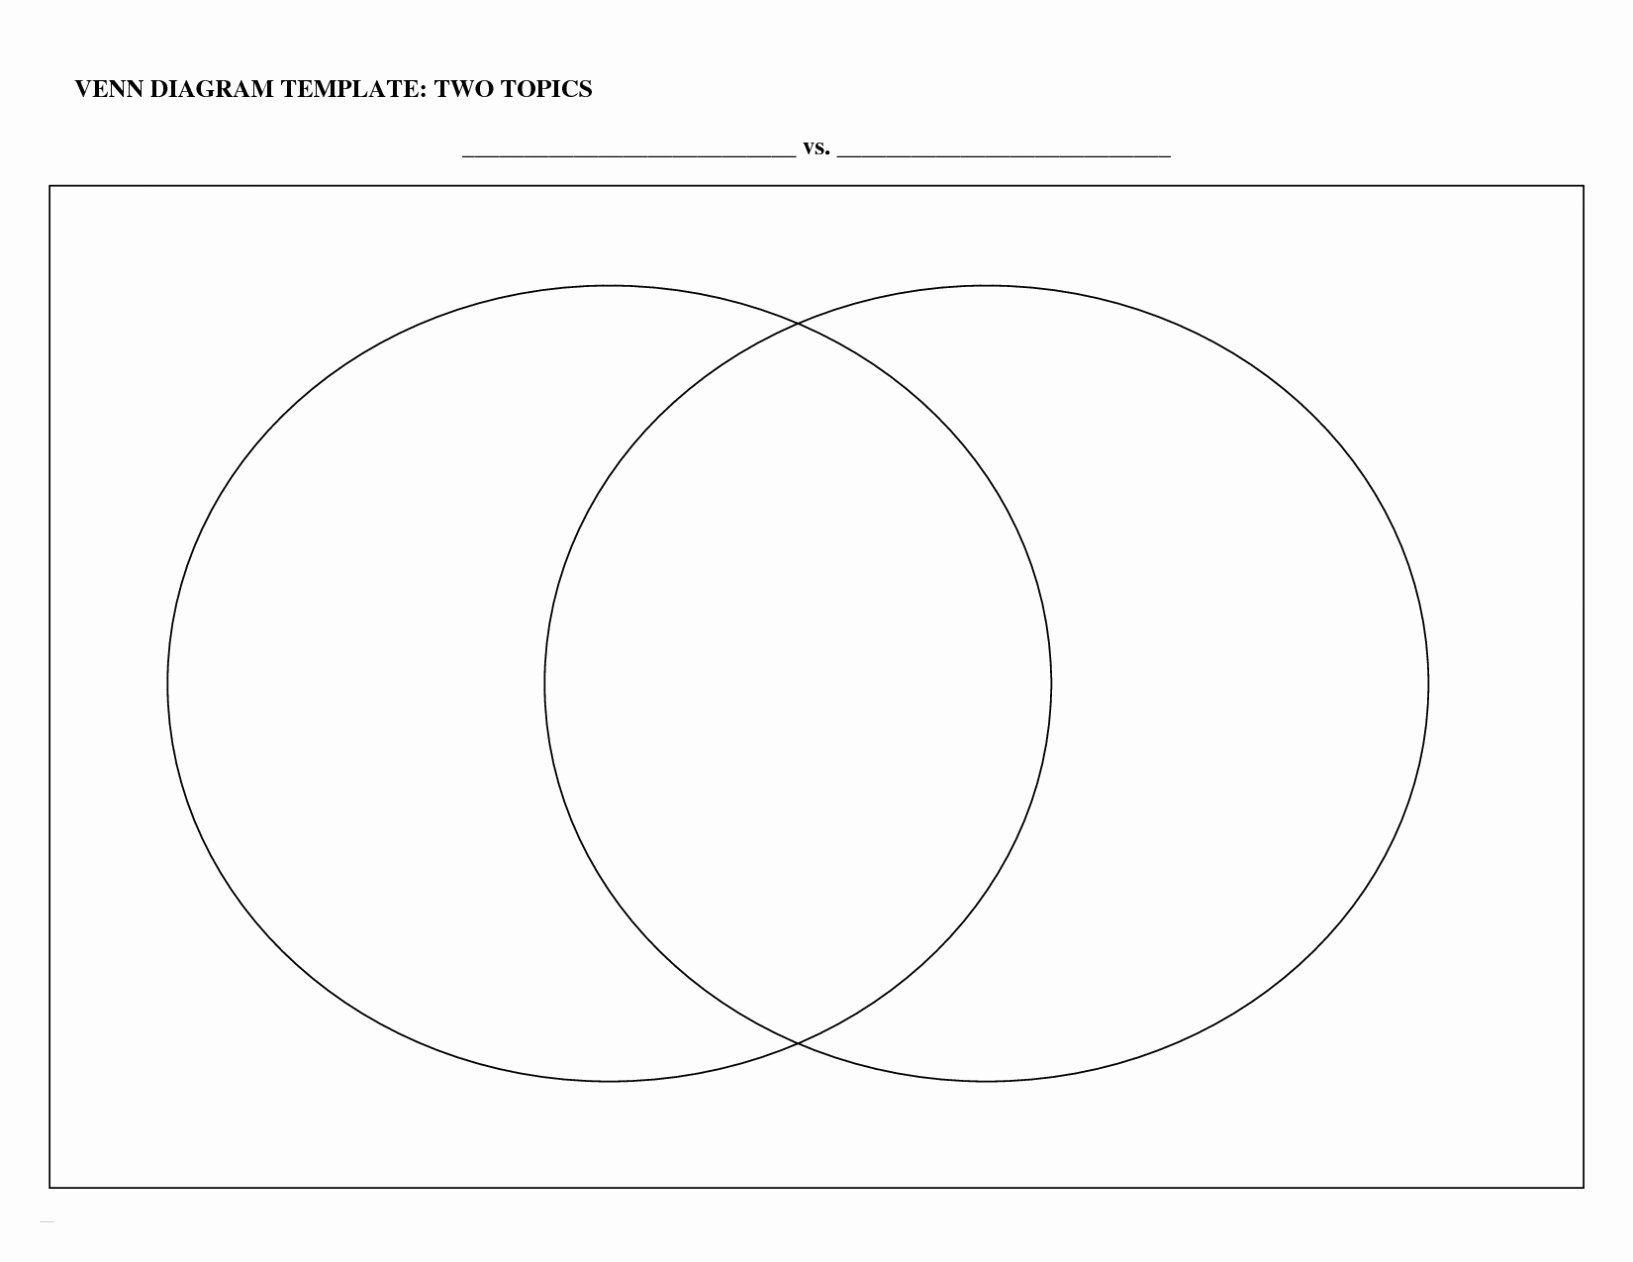 Venn Diagram Template Doc Inspirational Venn Diagram